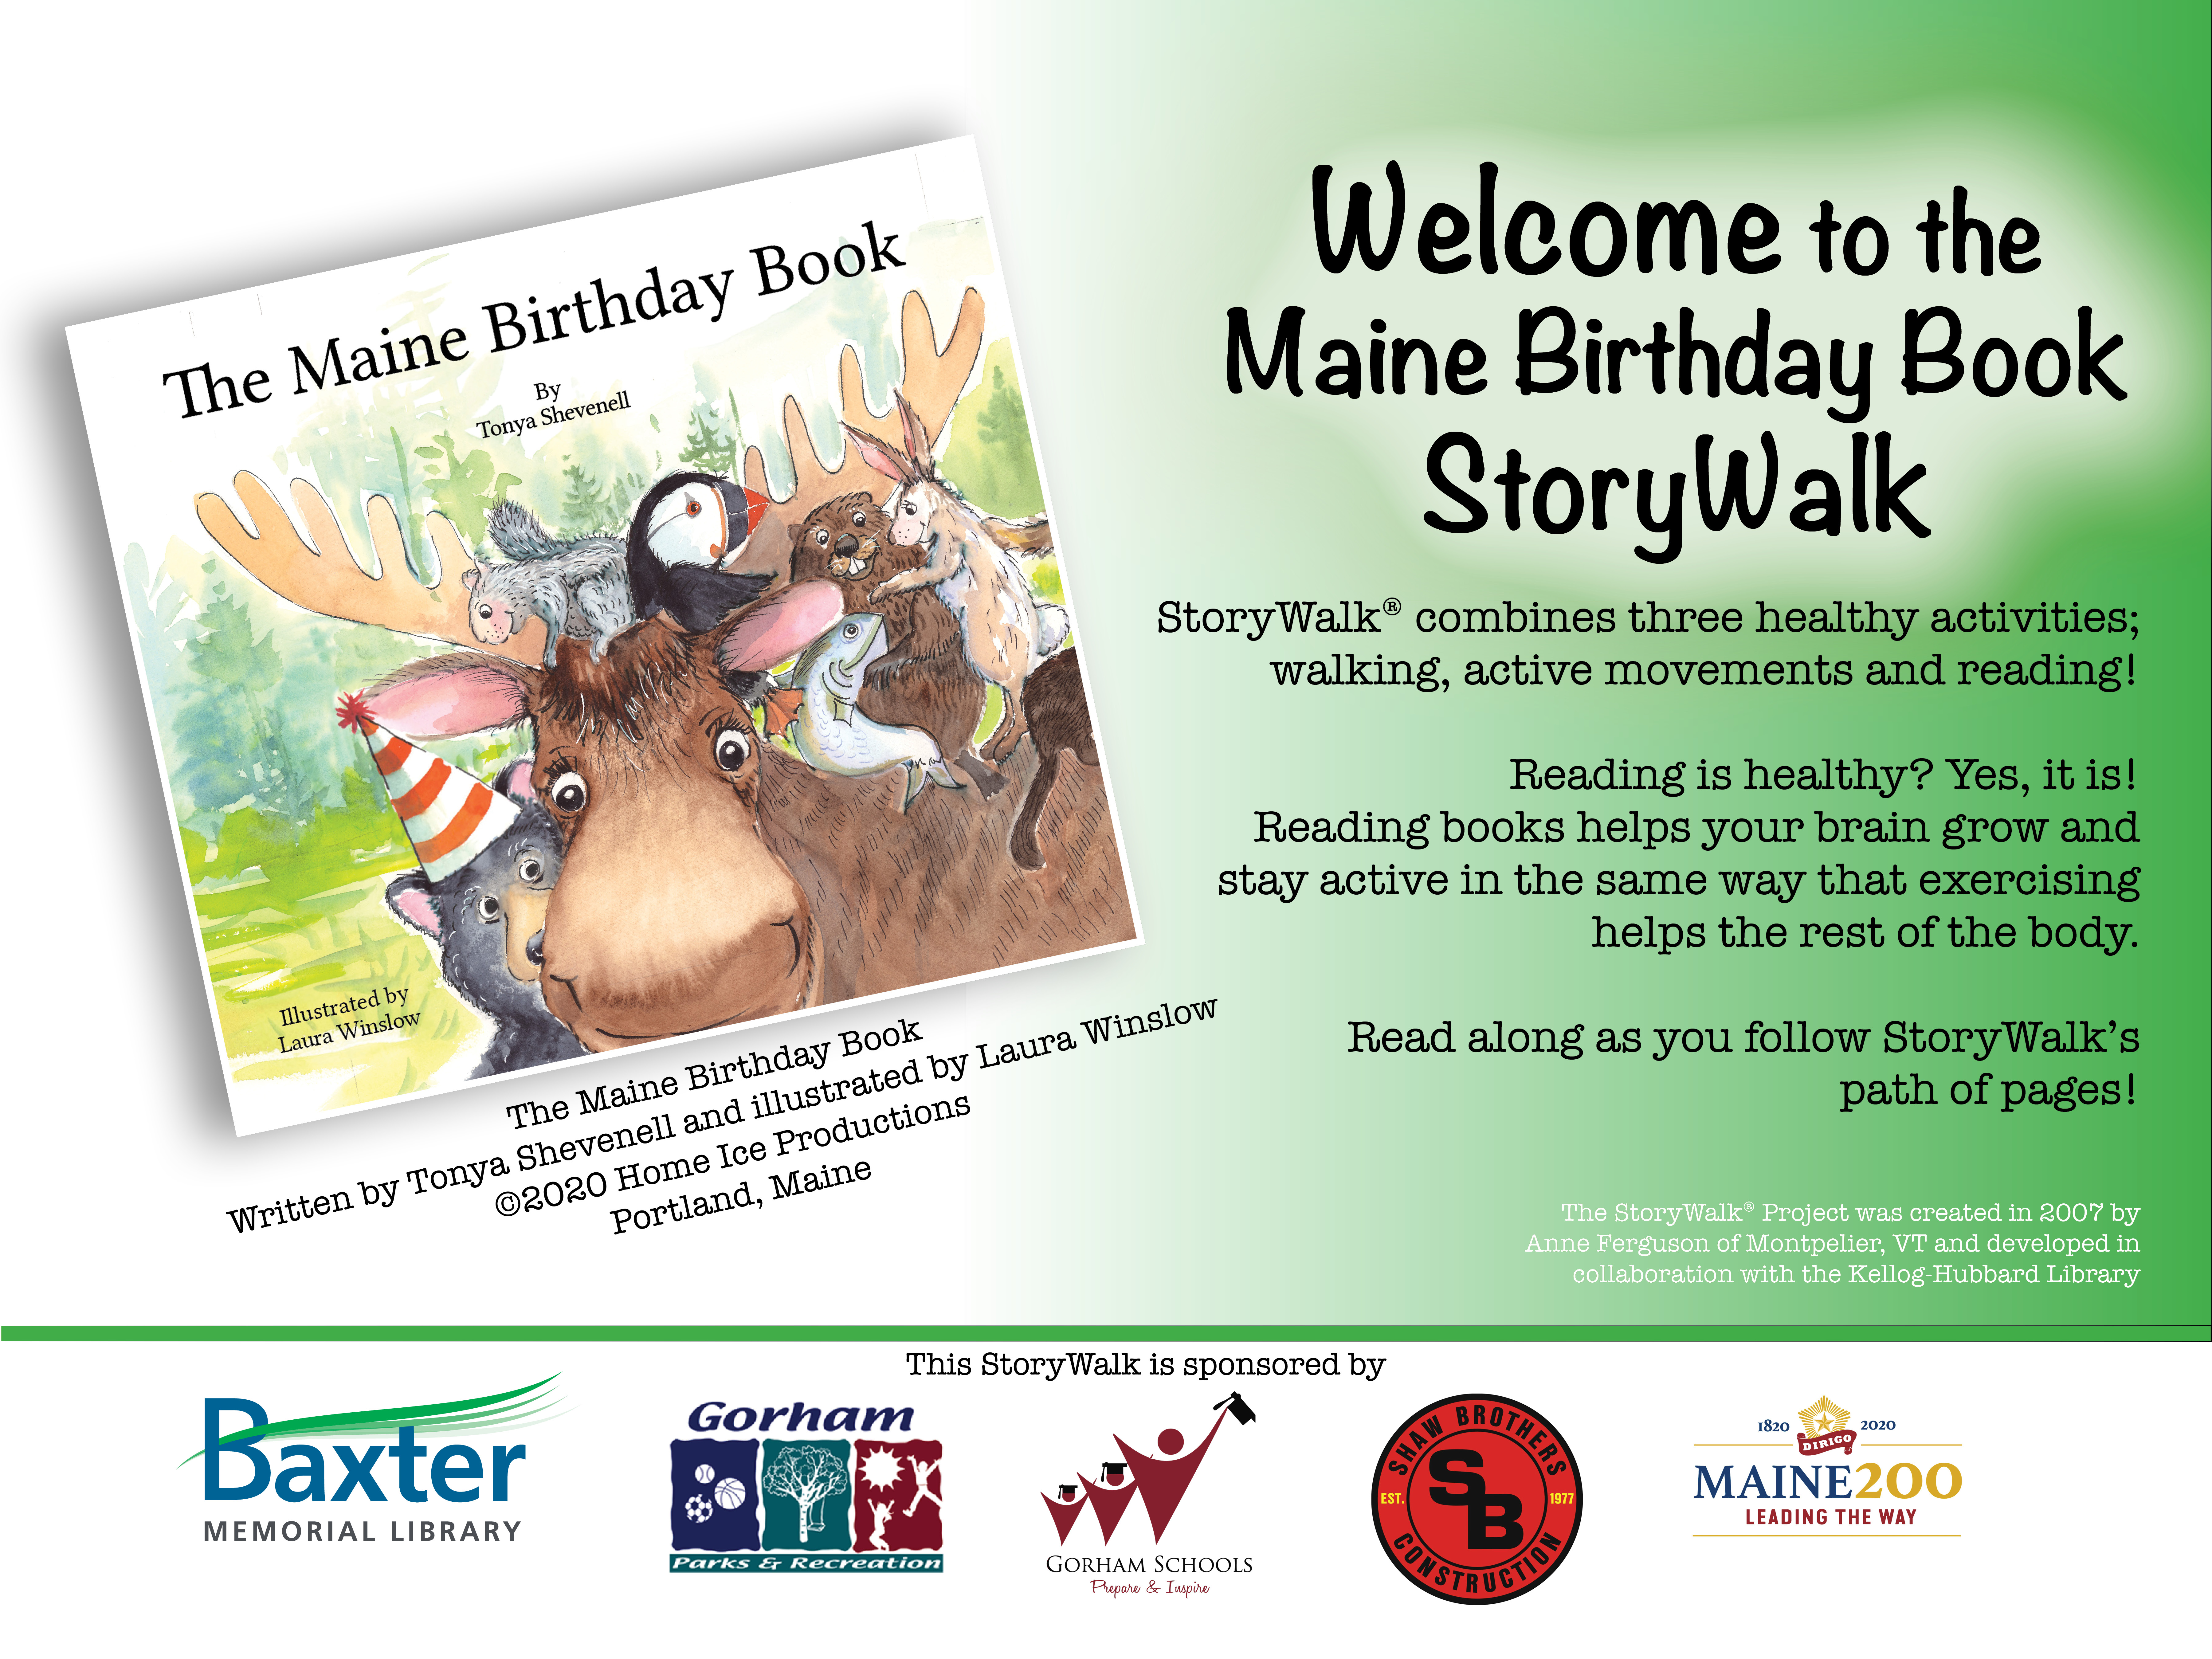 maine-birthday-book-storywalk_final